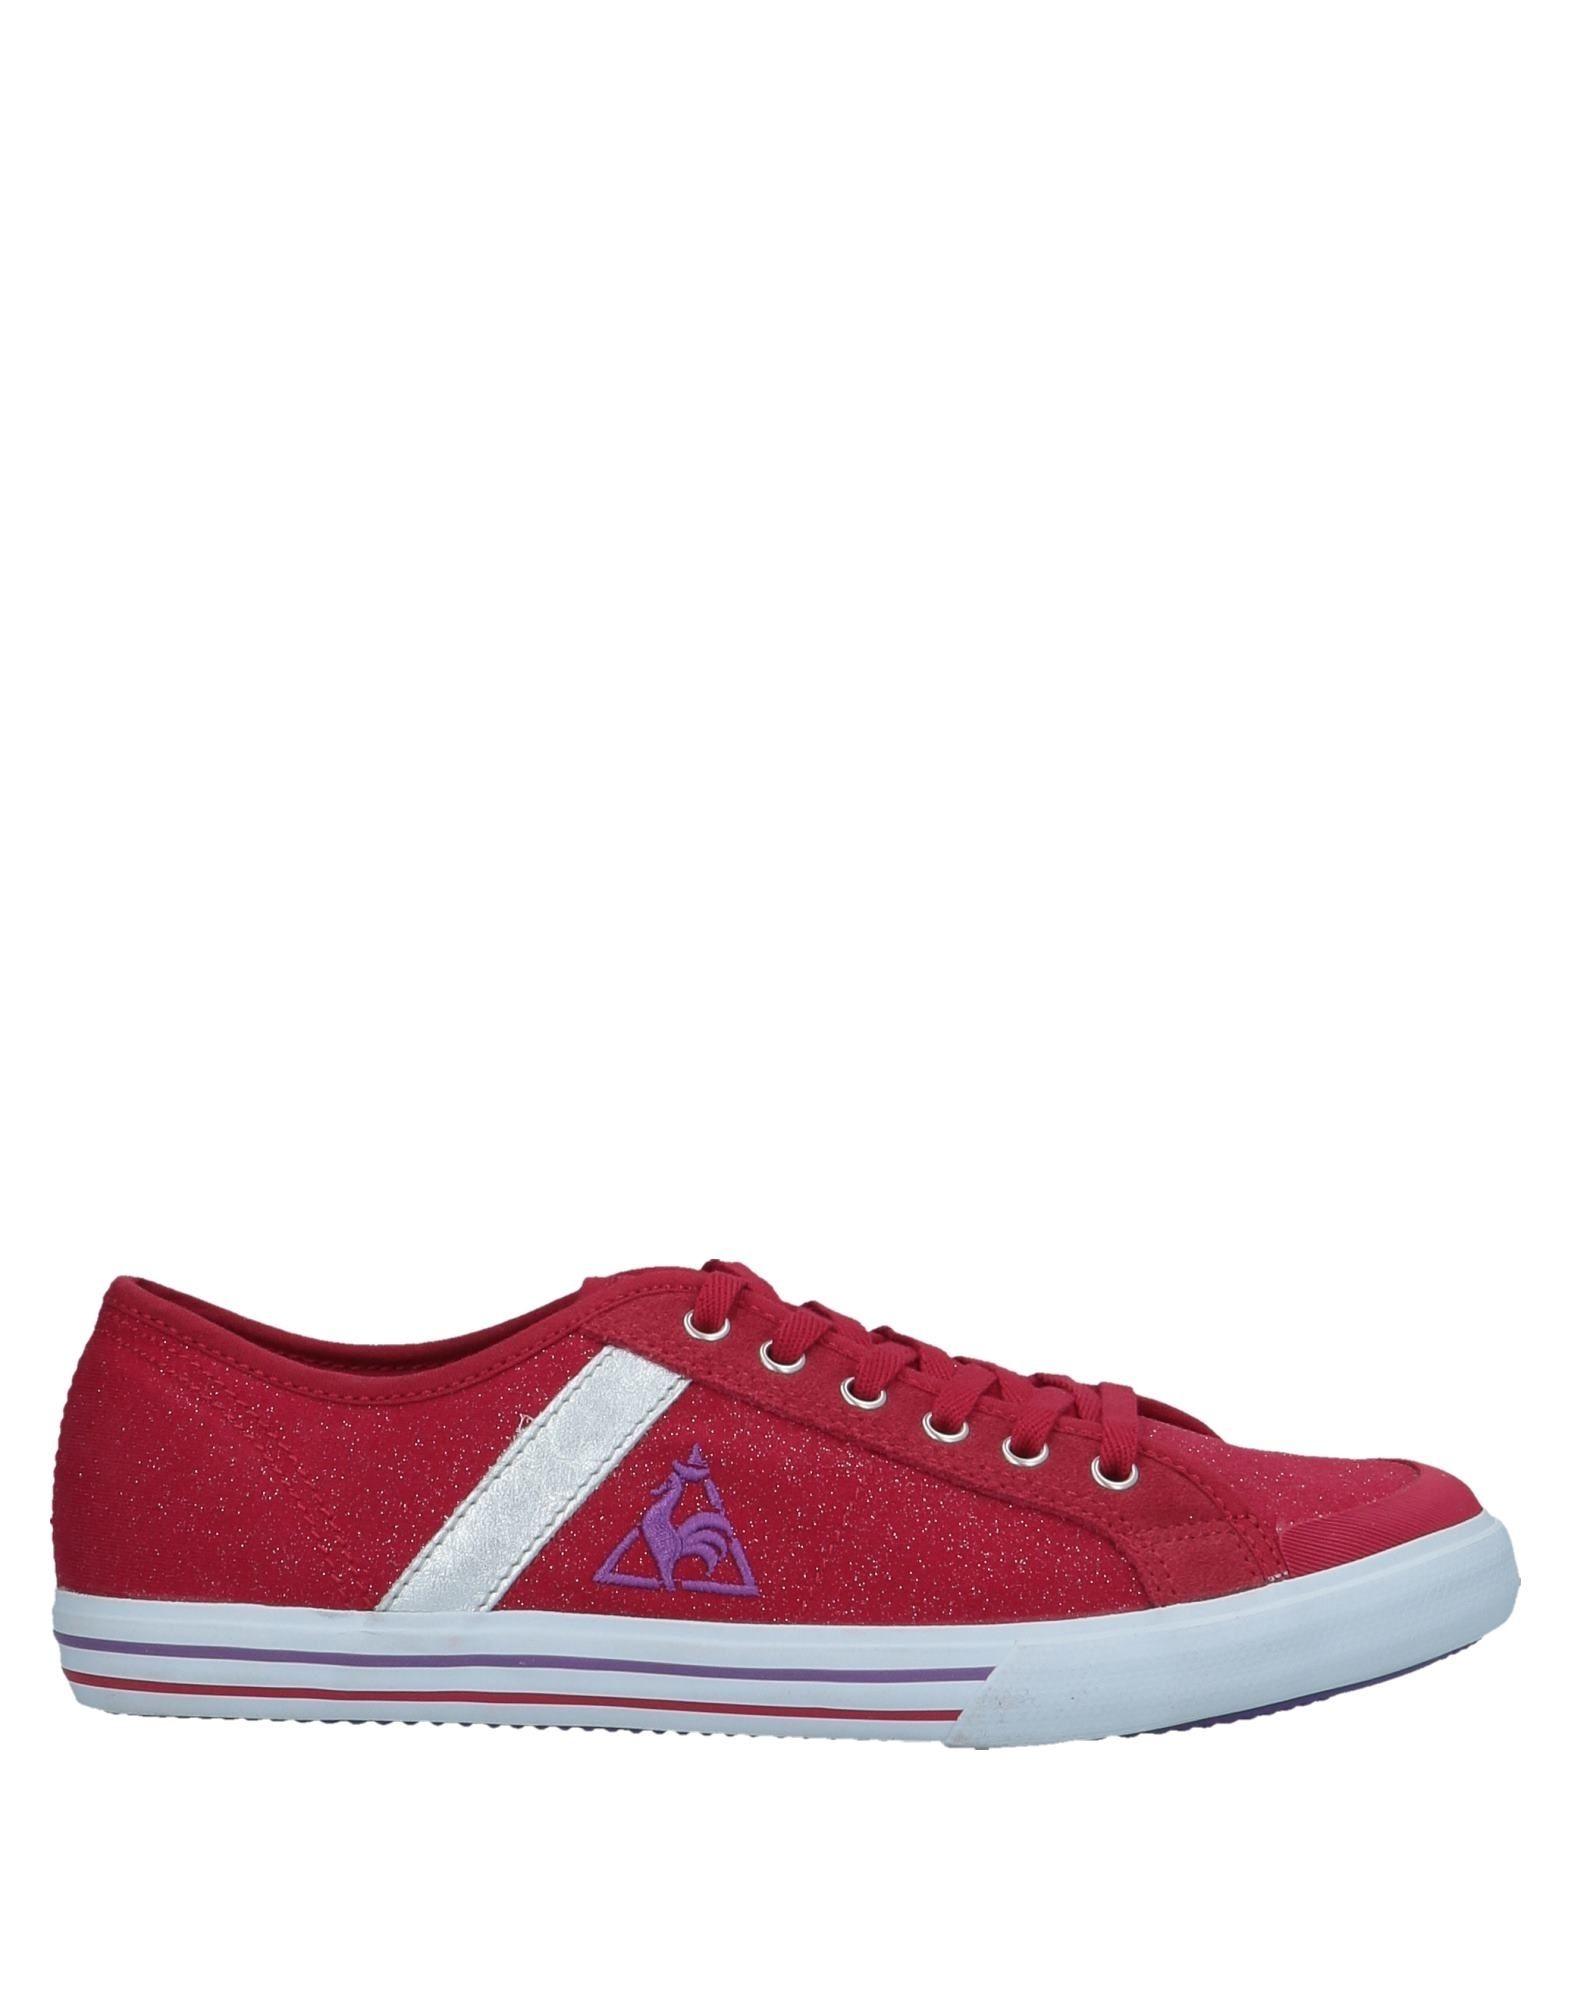 Sneakers Le Coq Sportif Donna - 11536904CN